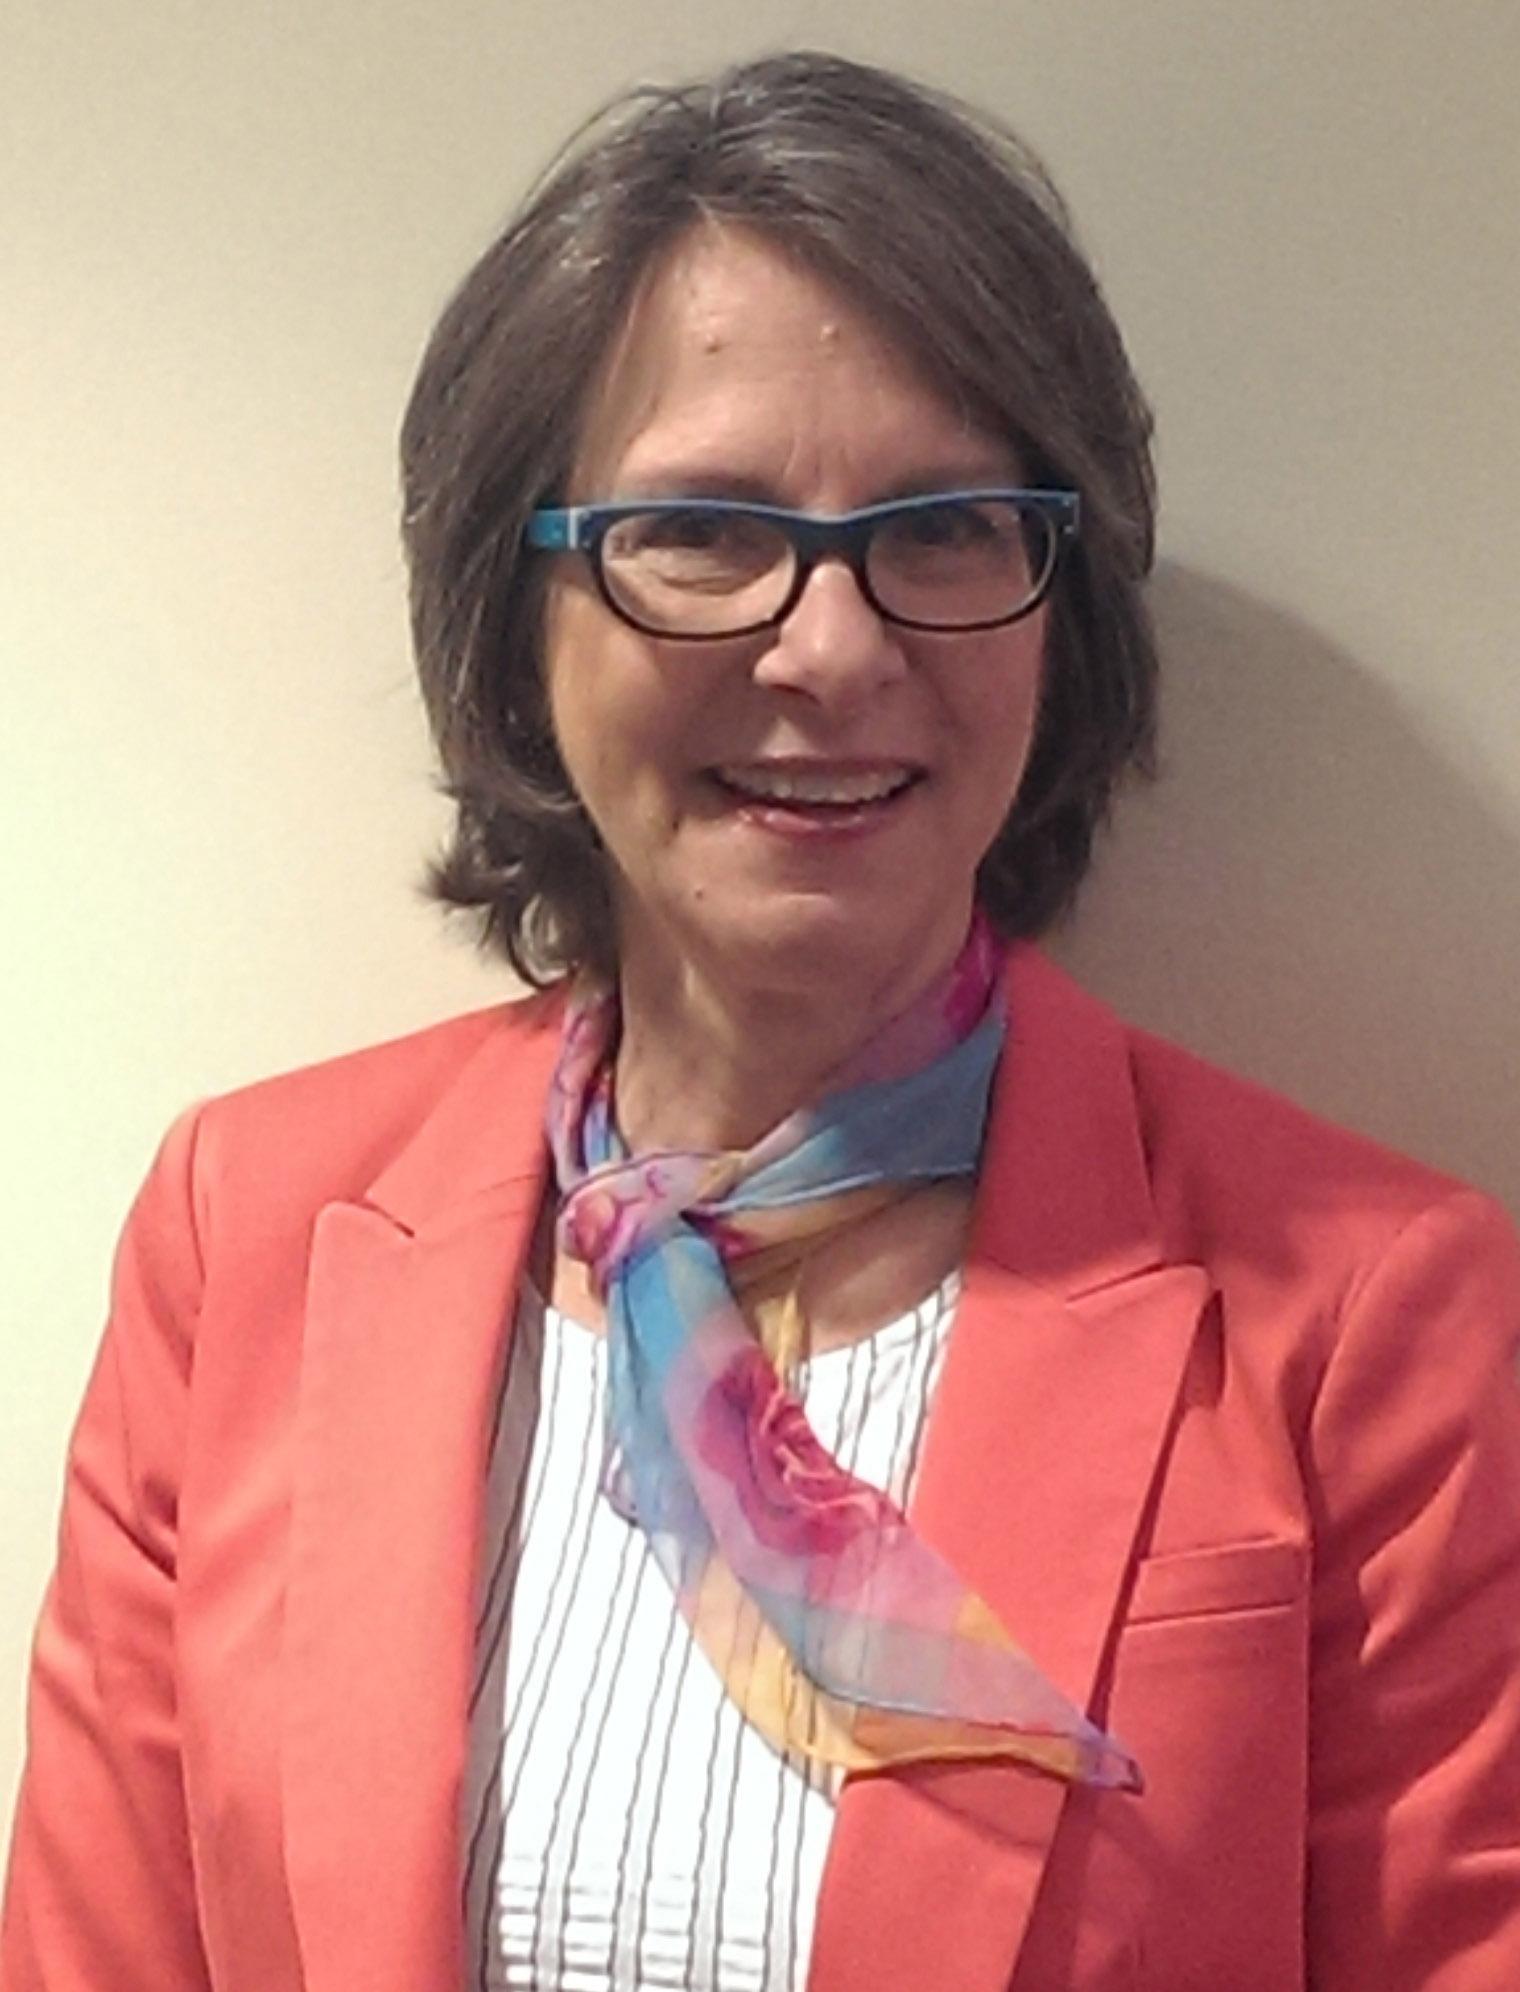 Dr. Heidi Maloni